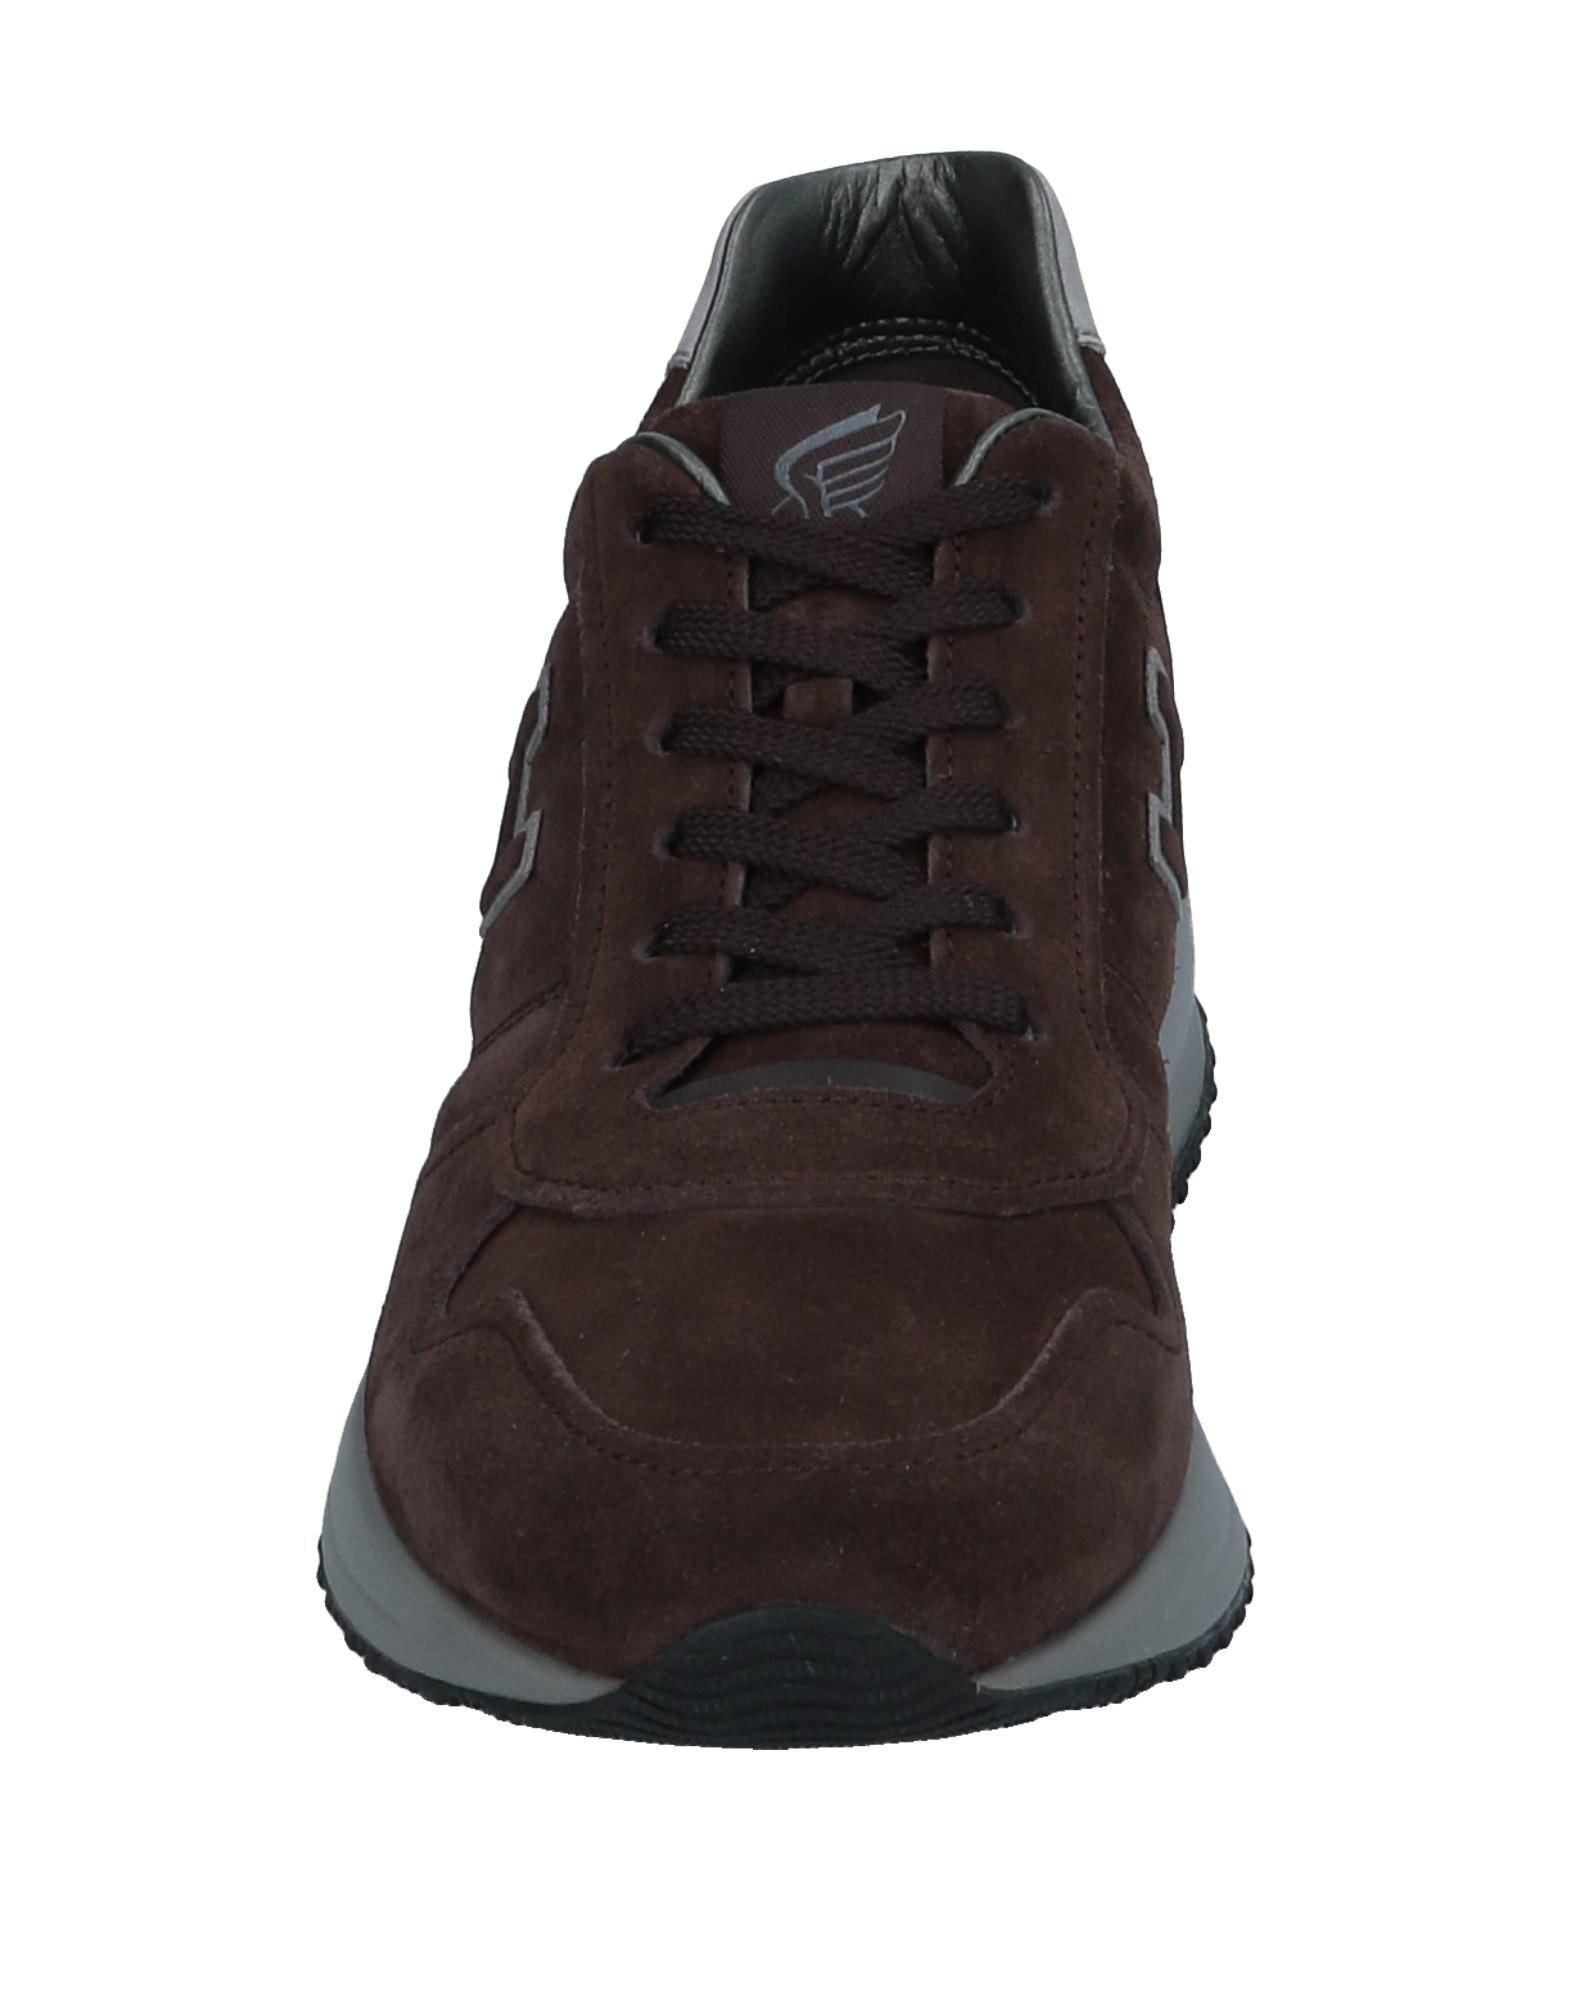 Hogan Hogan  Sneakers Herren  11541054BR Heiße Schuhe 9356dc